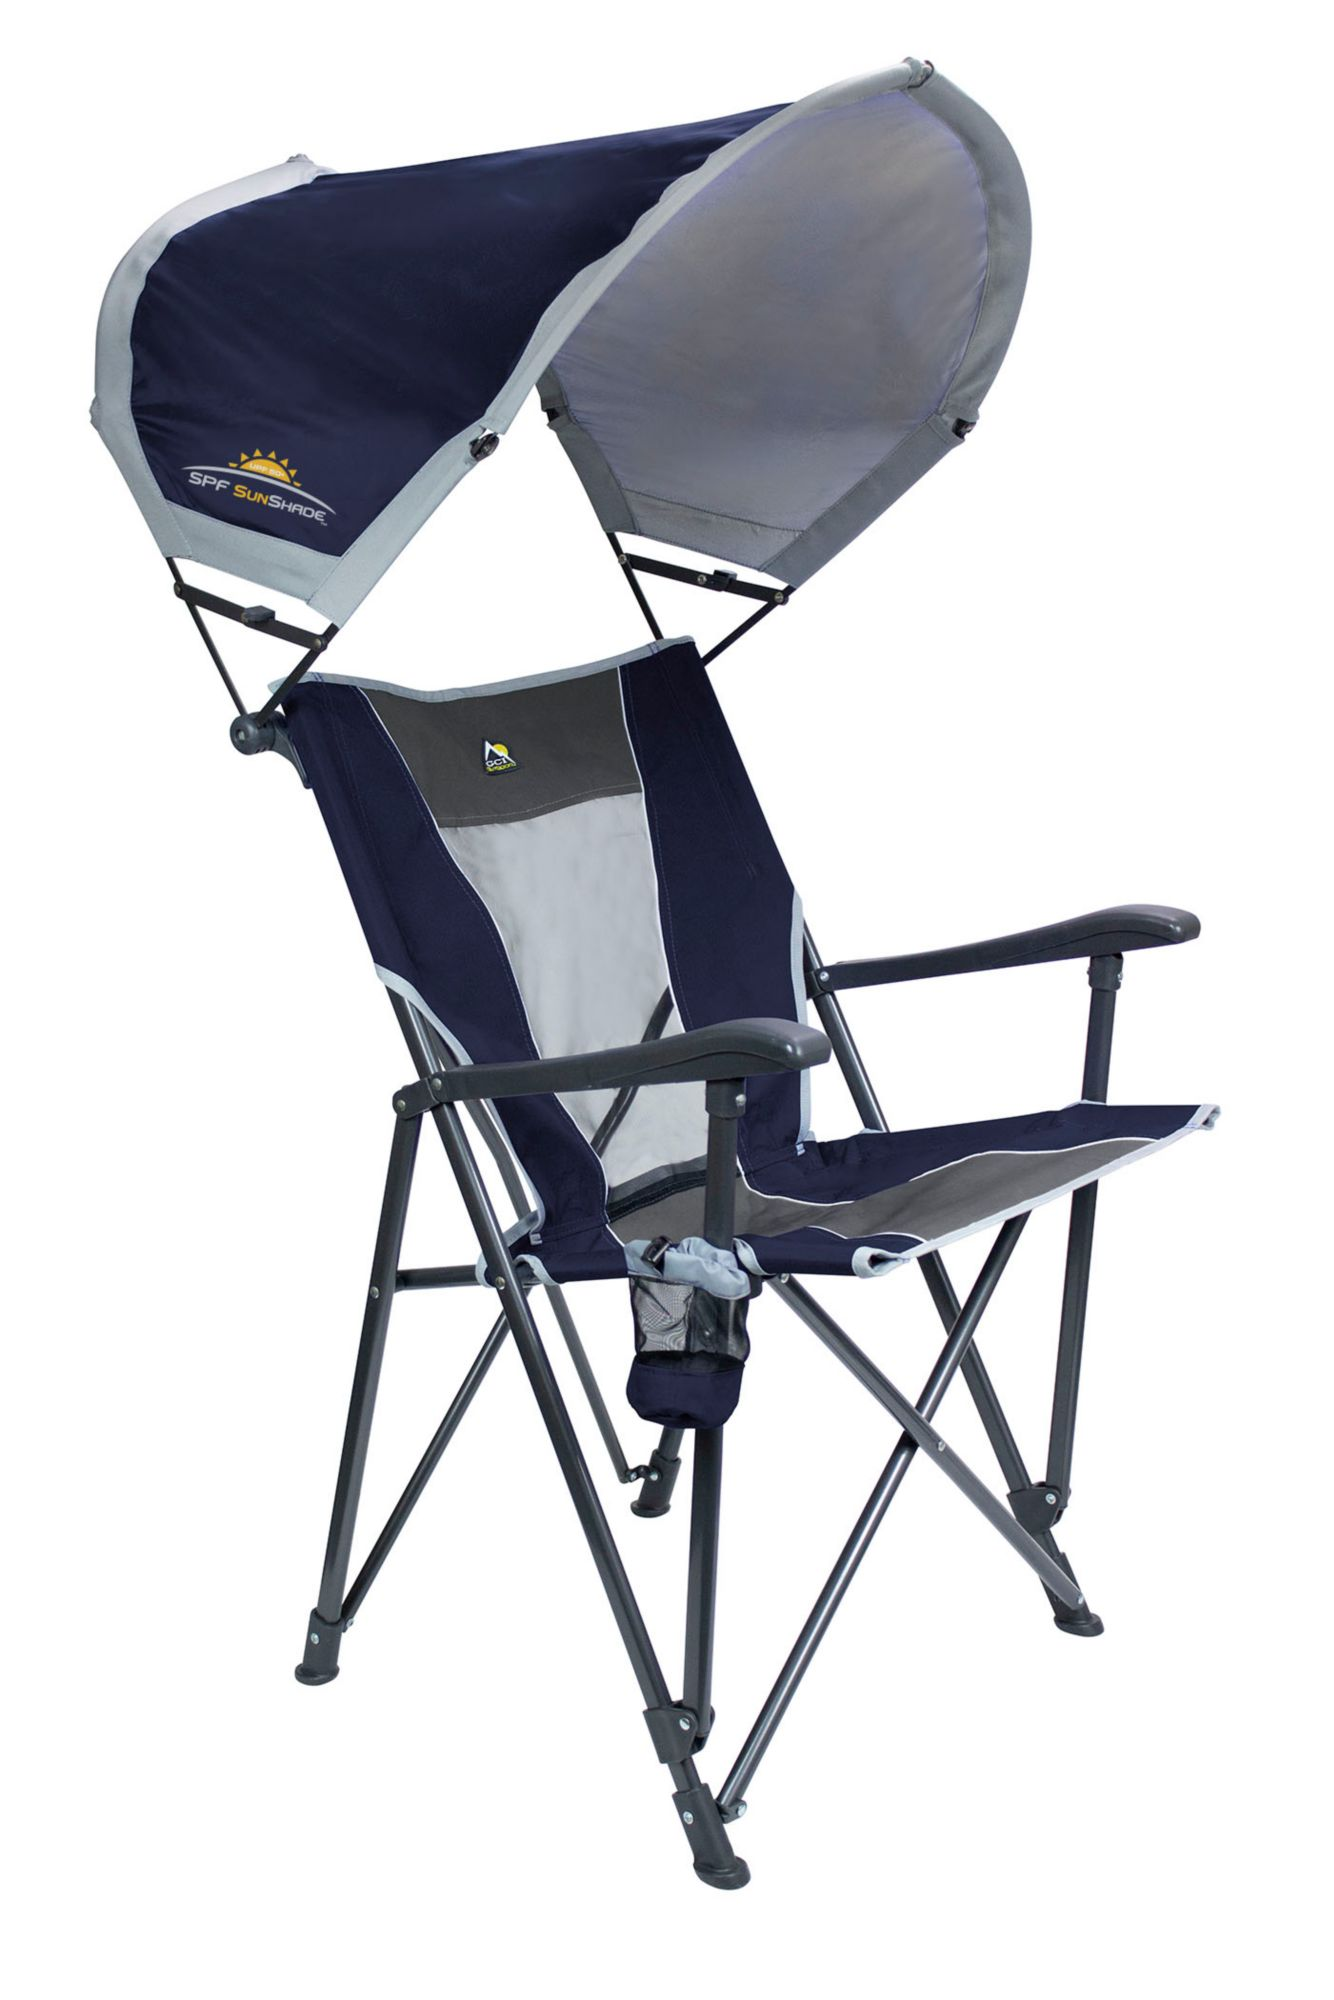 1  sc 1 st  DICKu0027S Sporting Goods & GCI Outdoor SunShade Eazy Chair | DICKu0027S Sporting Goods